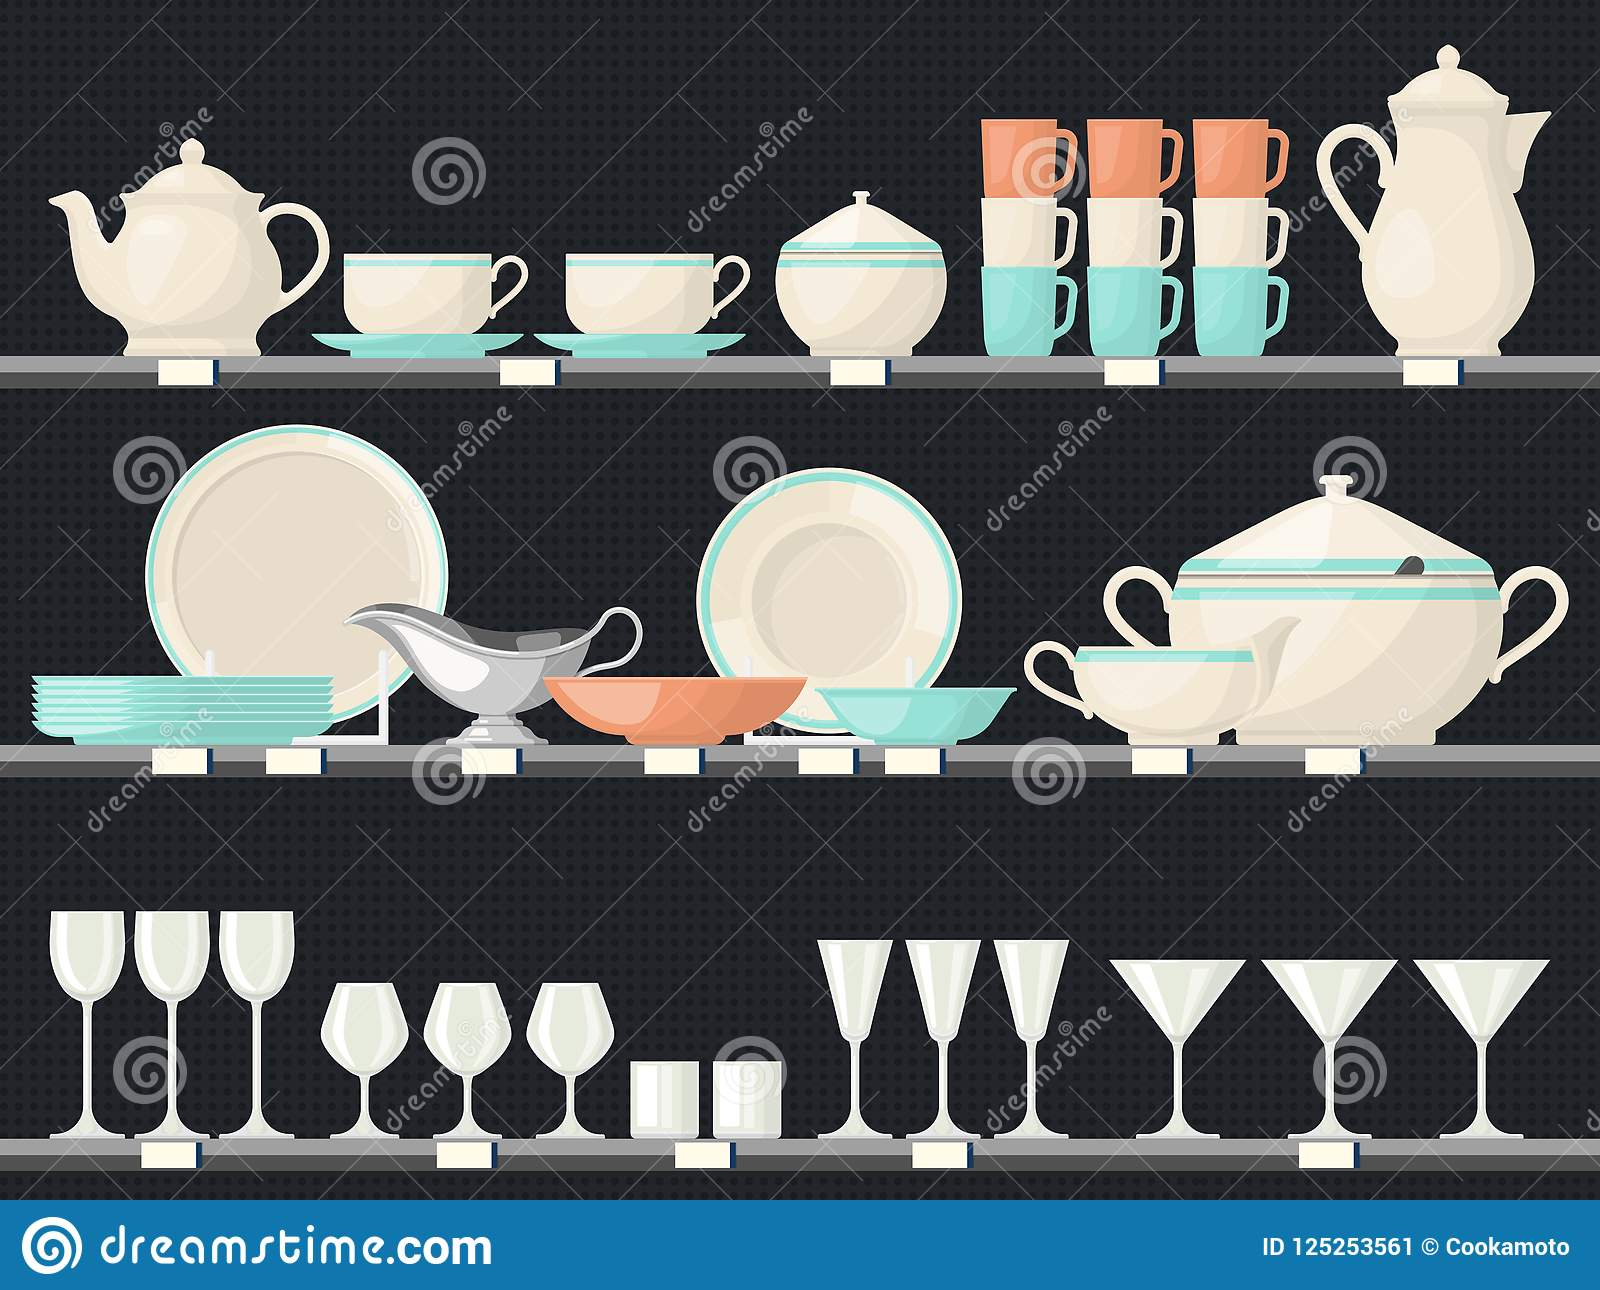 Shelves With Glassware Dish Or Kitchen Utensil Stock Vector ...